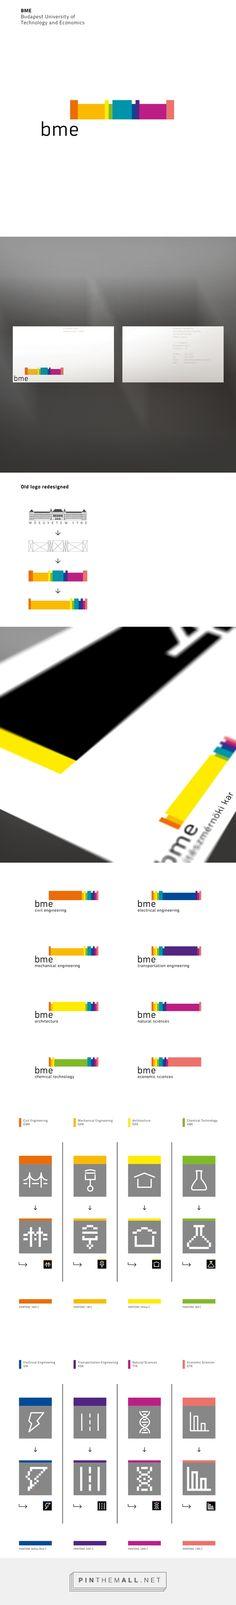 BME - Budapest University of Technology and Economics   Brands Alive #dynamic #branding